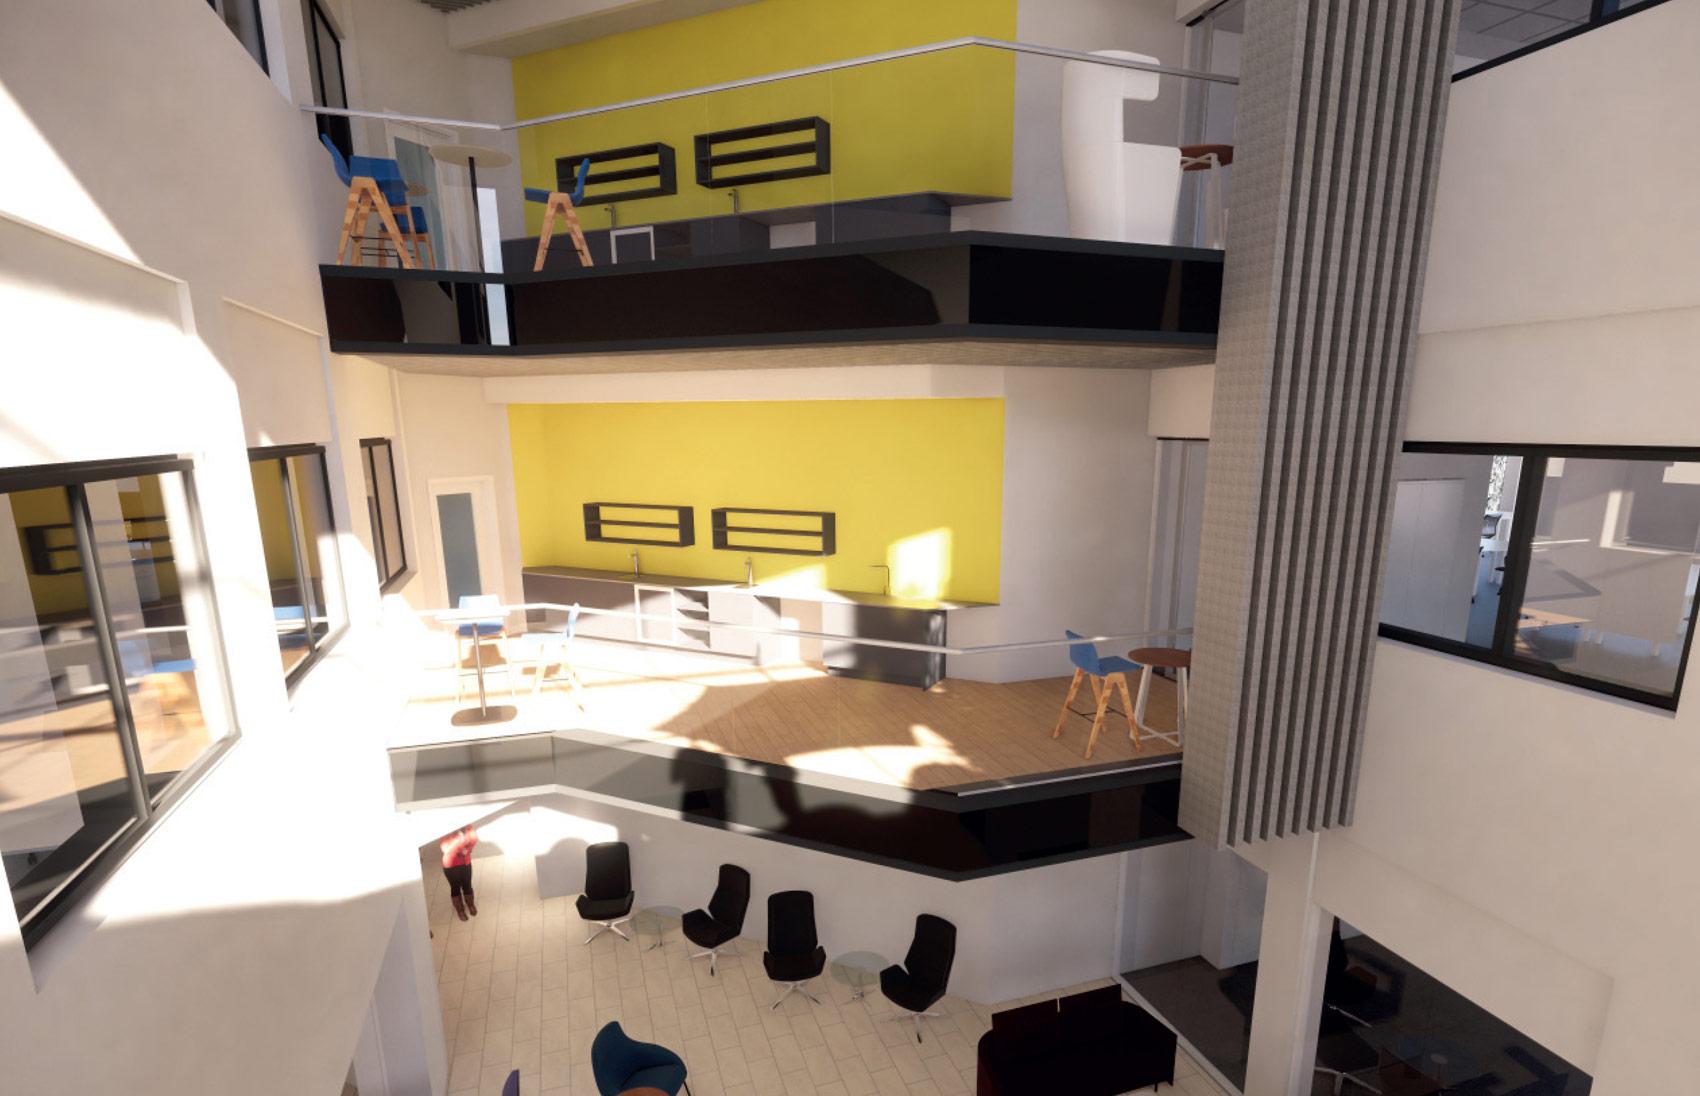 Leeds Building Society, 3D Visual of the interior walkways